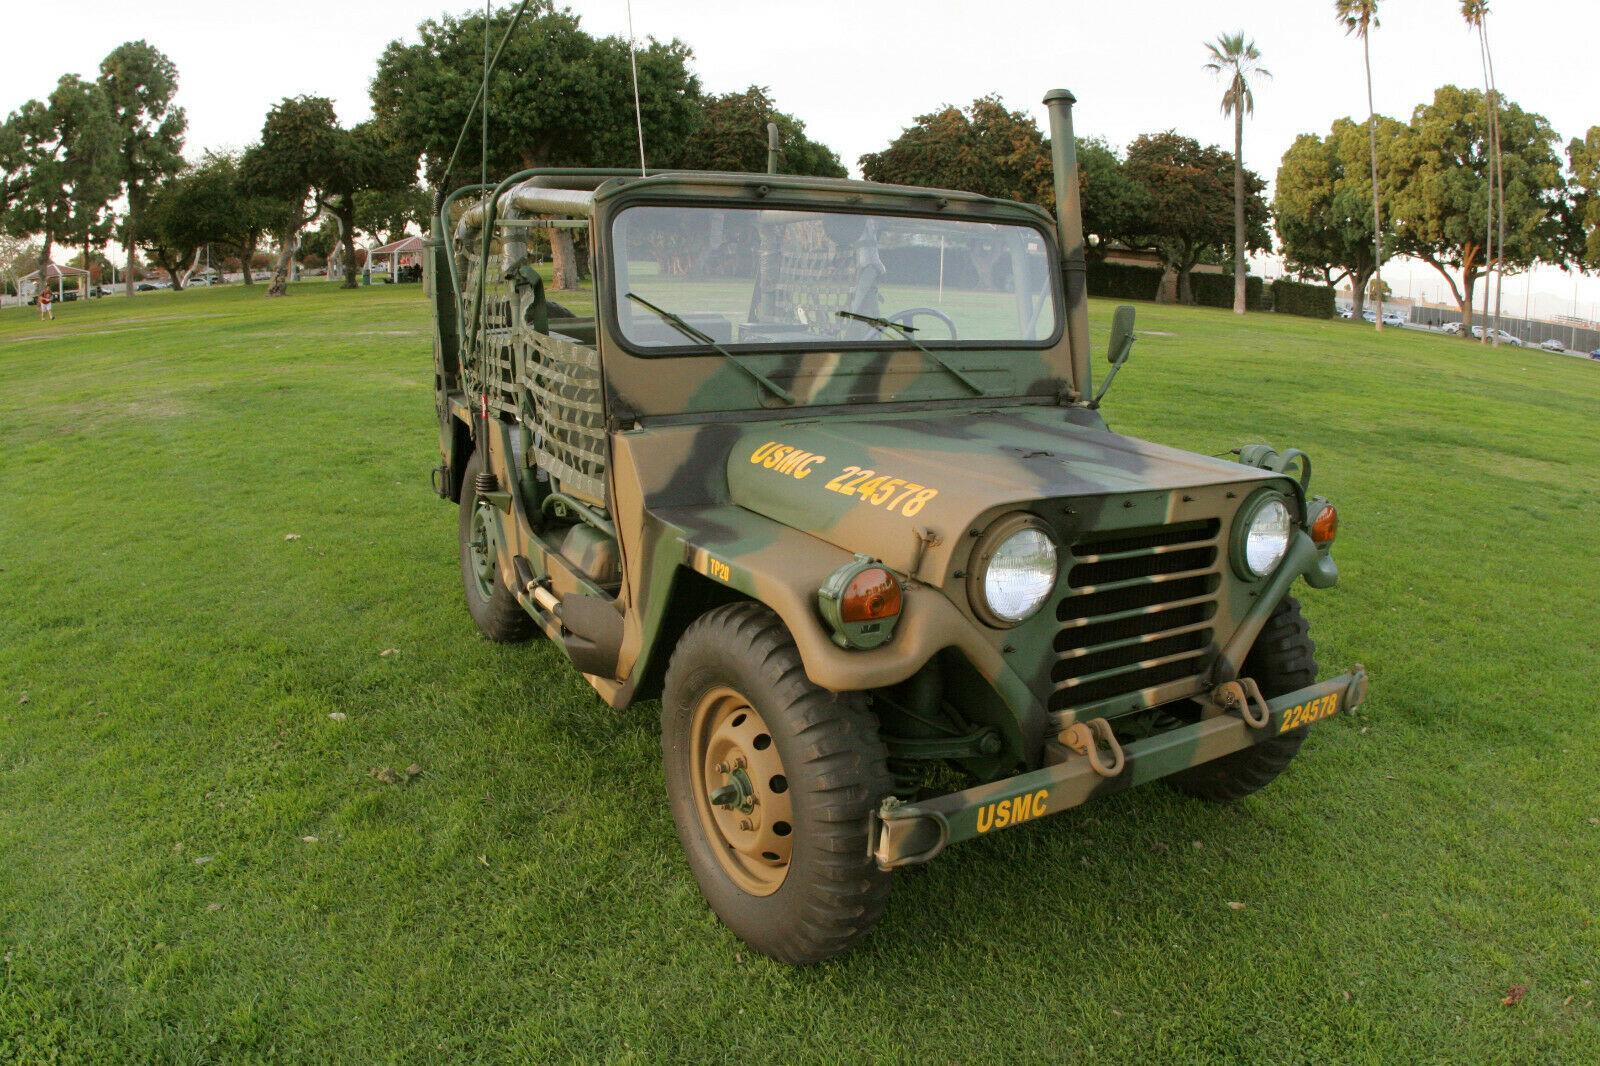 restored 1971 AM General M151A2 USMC military